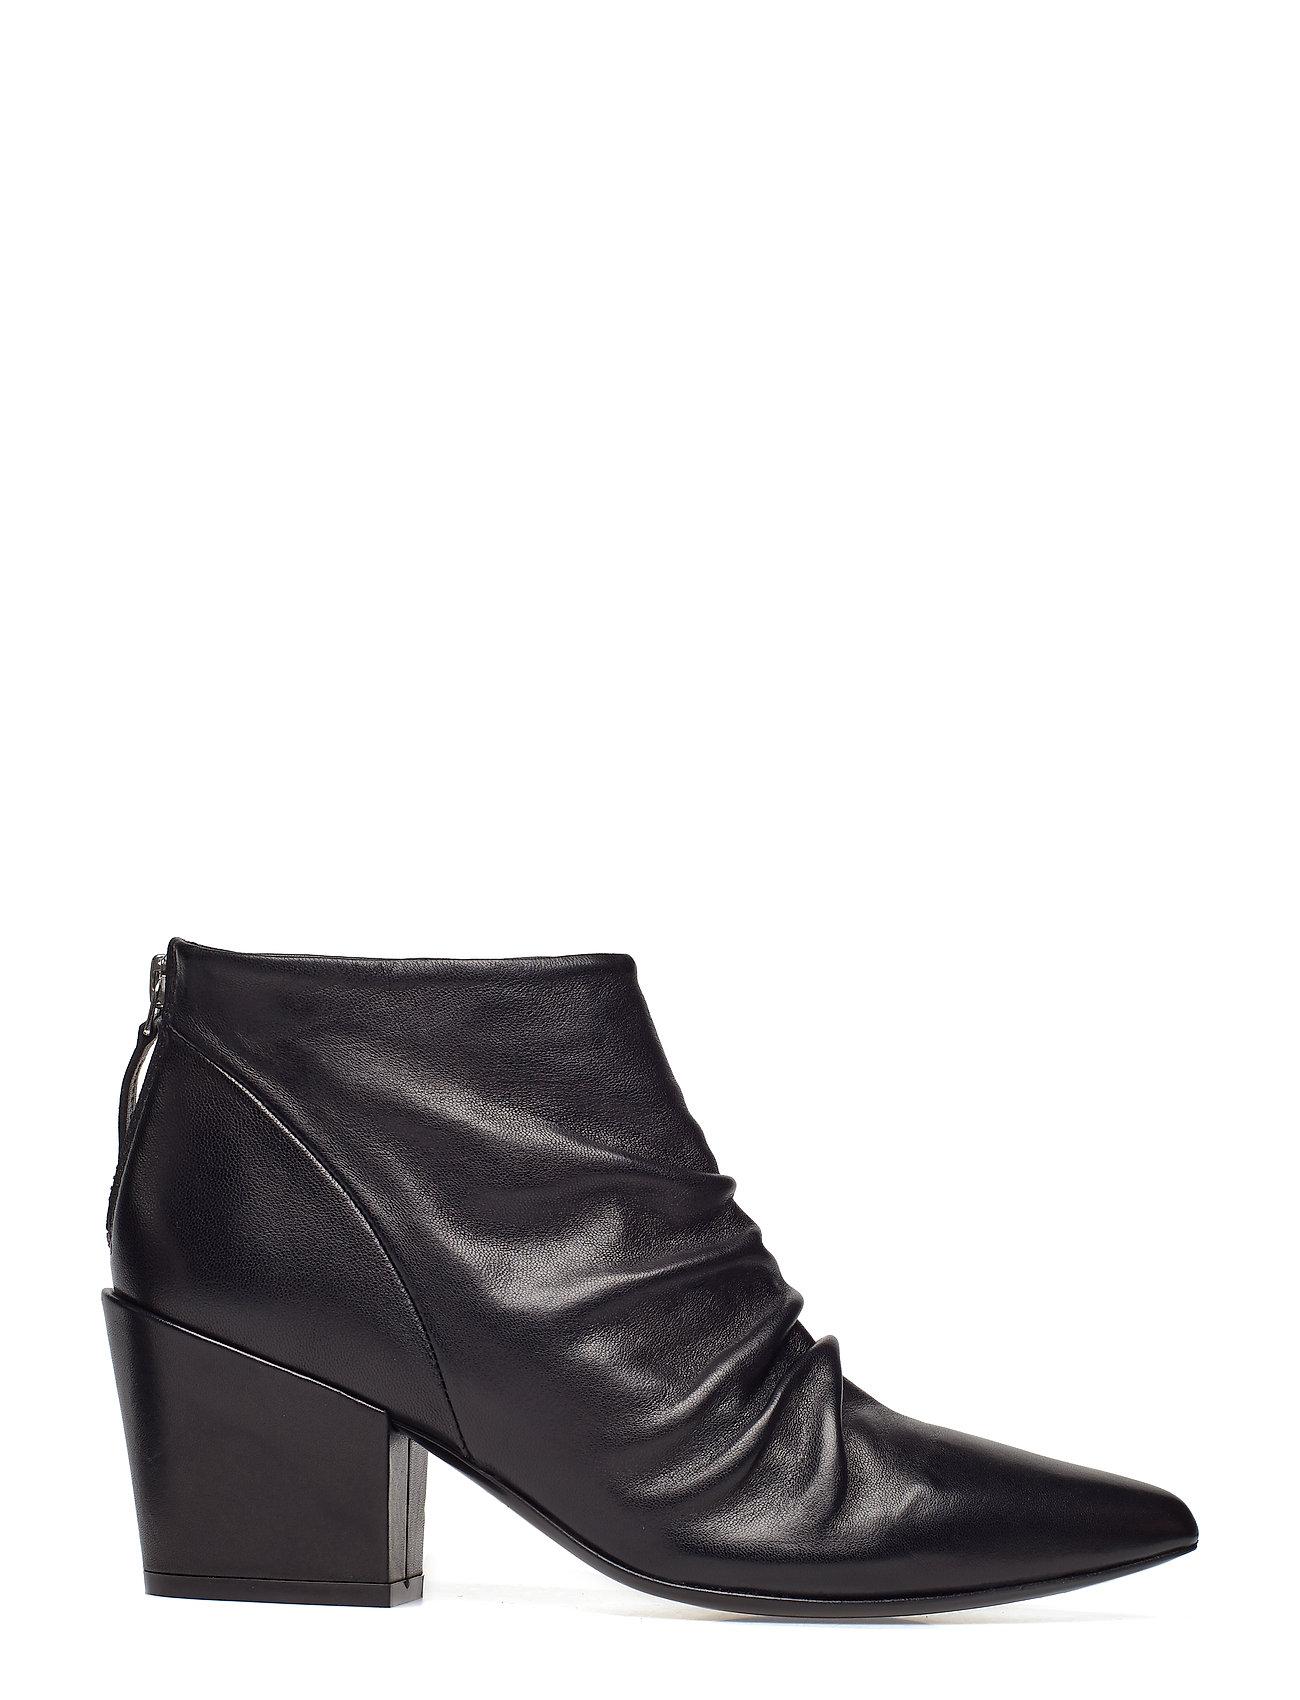 Boots 8740 Shoes Boots Ankle Boots Ankle Boots With Heel Sort Billi Bi